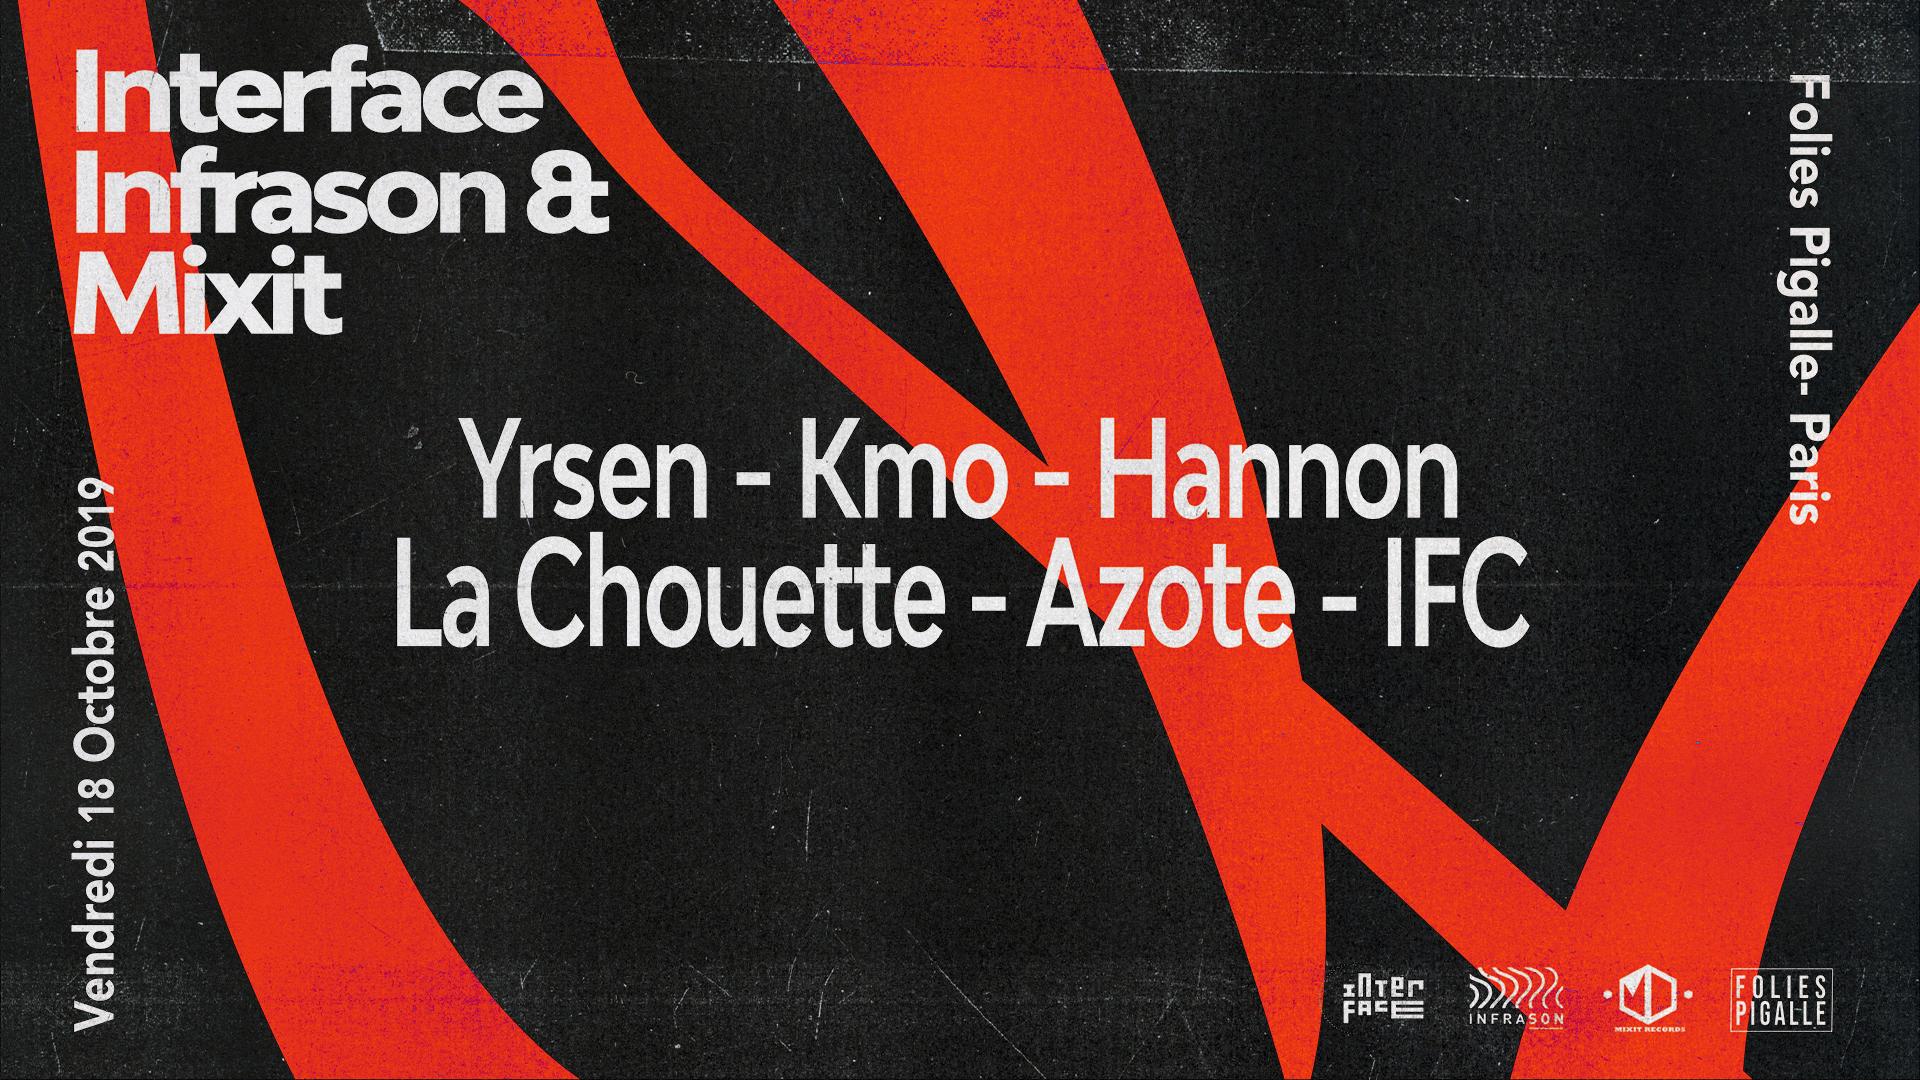 Infrason/Mix'it/Interface aux Folies Pigalle